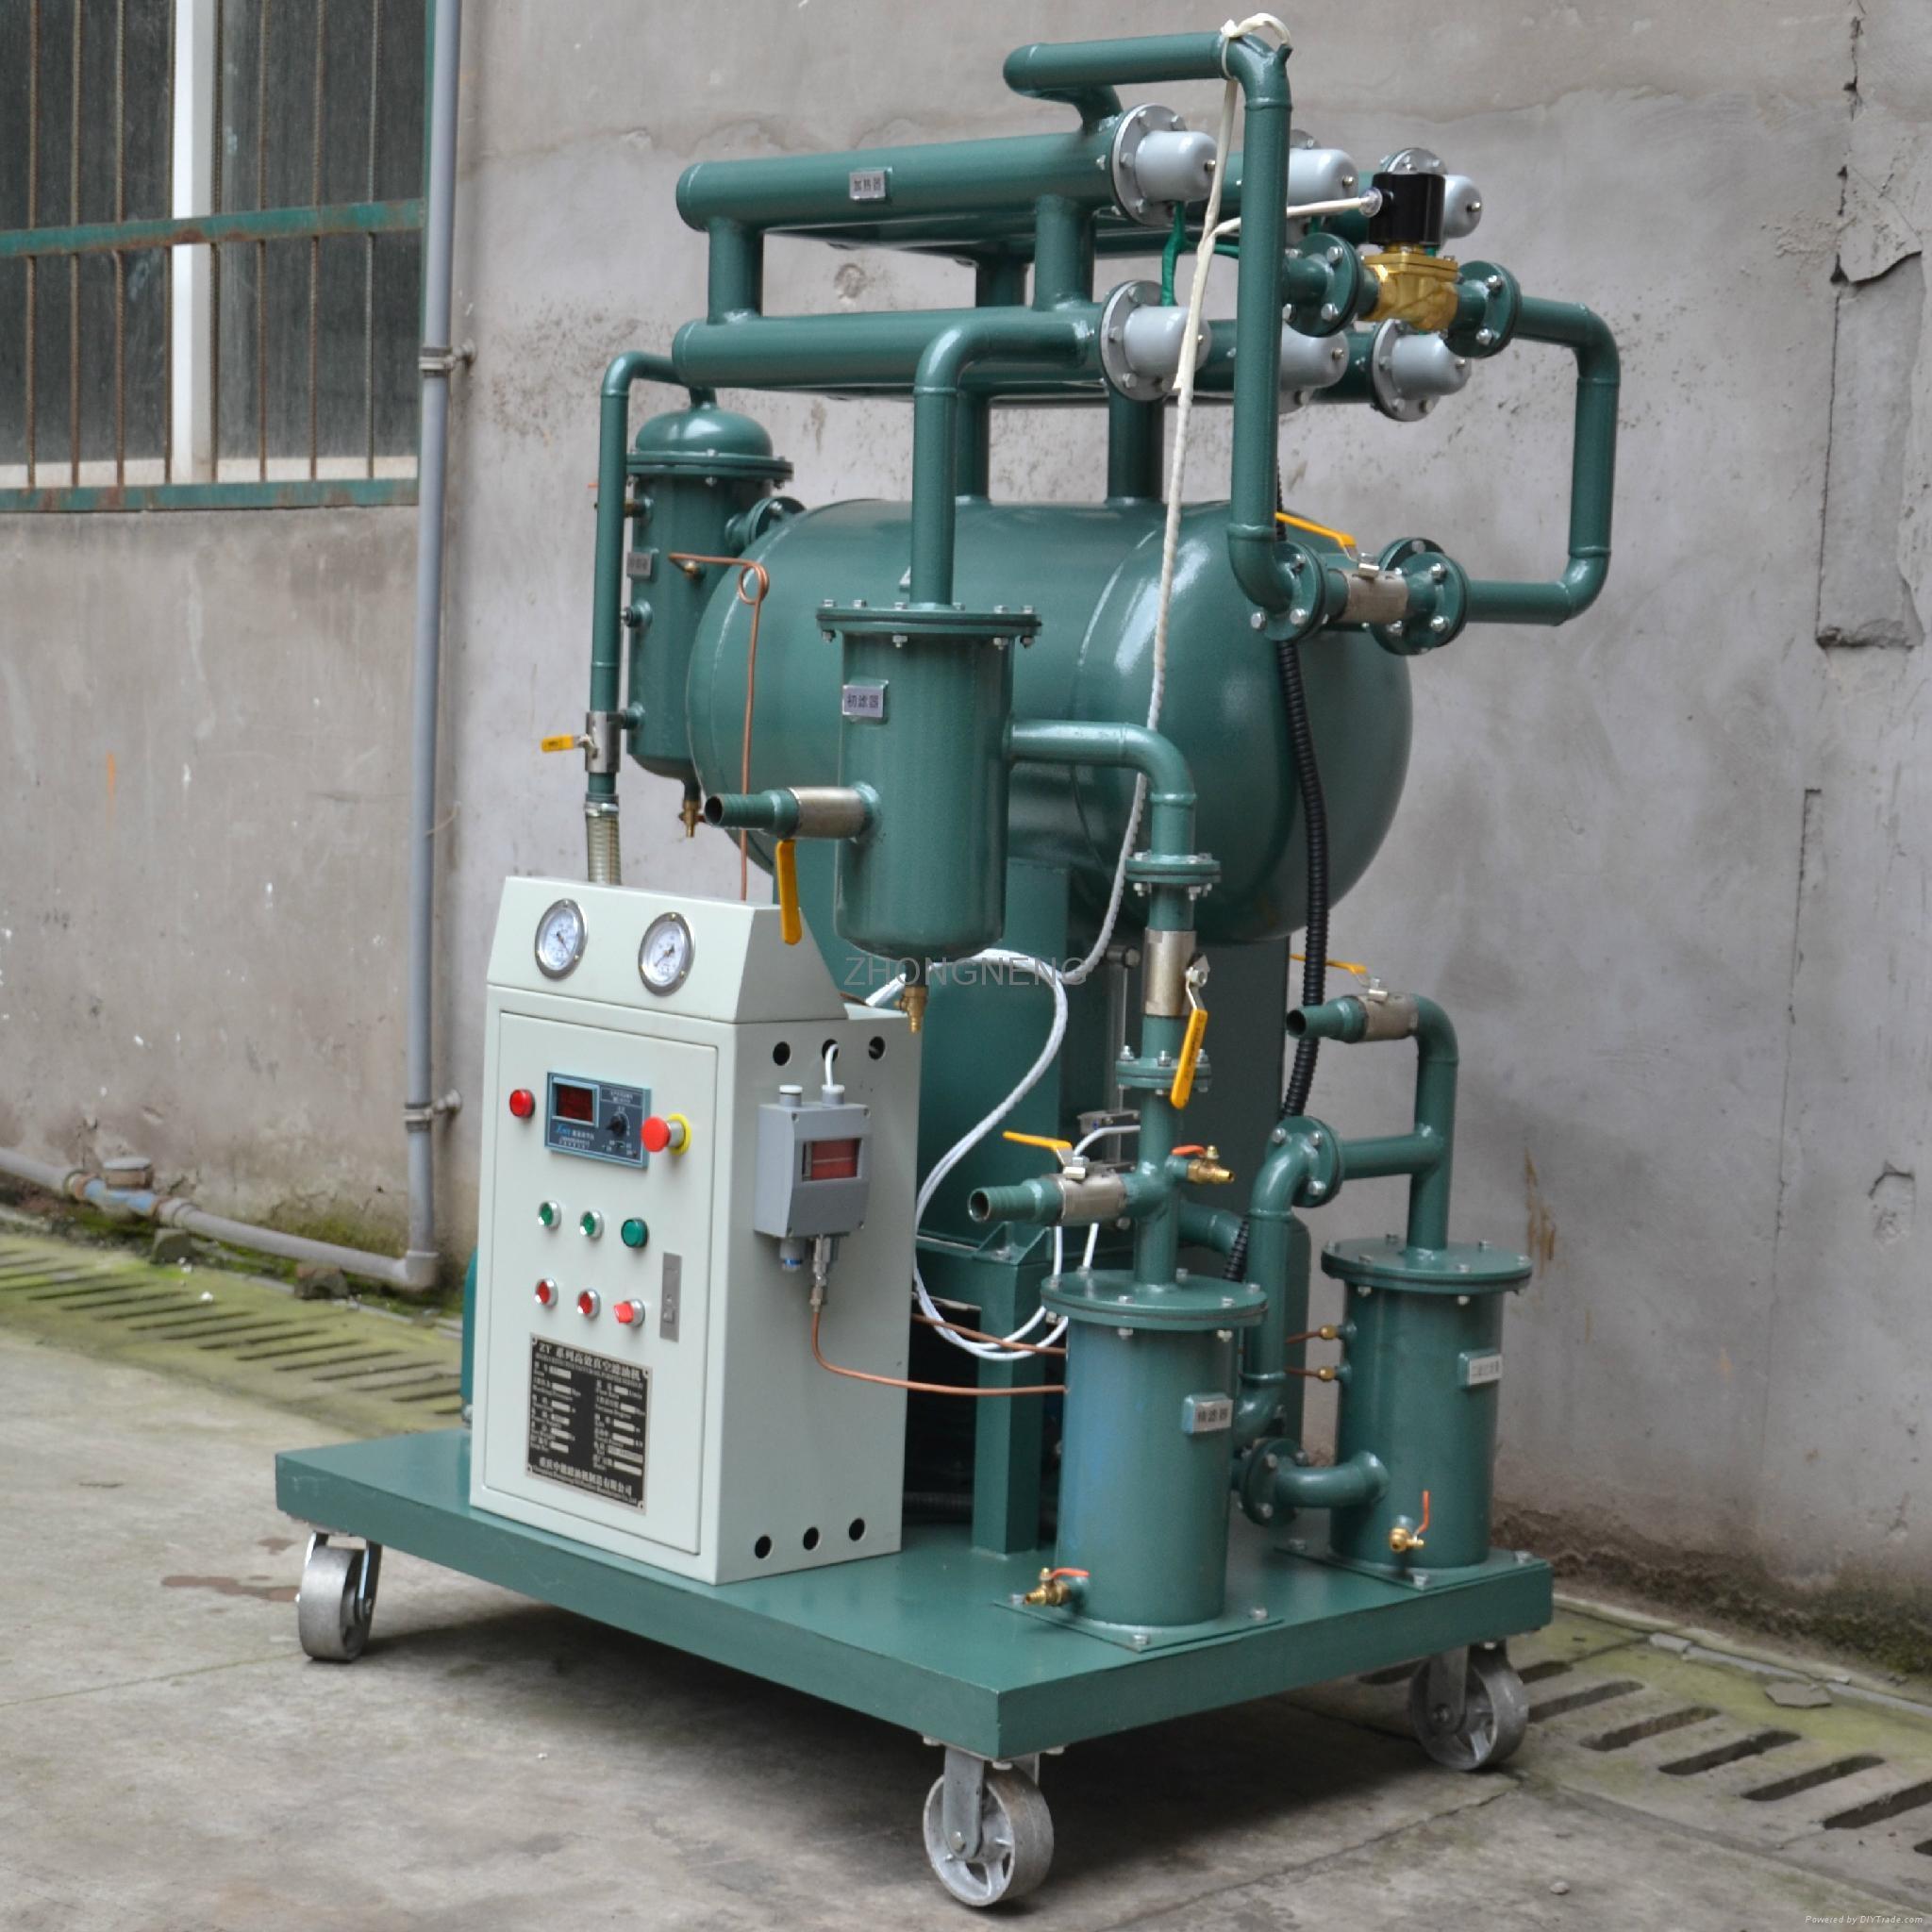 Waste Transformer Oil Recycling Machine  4